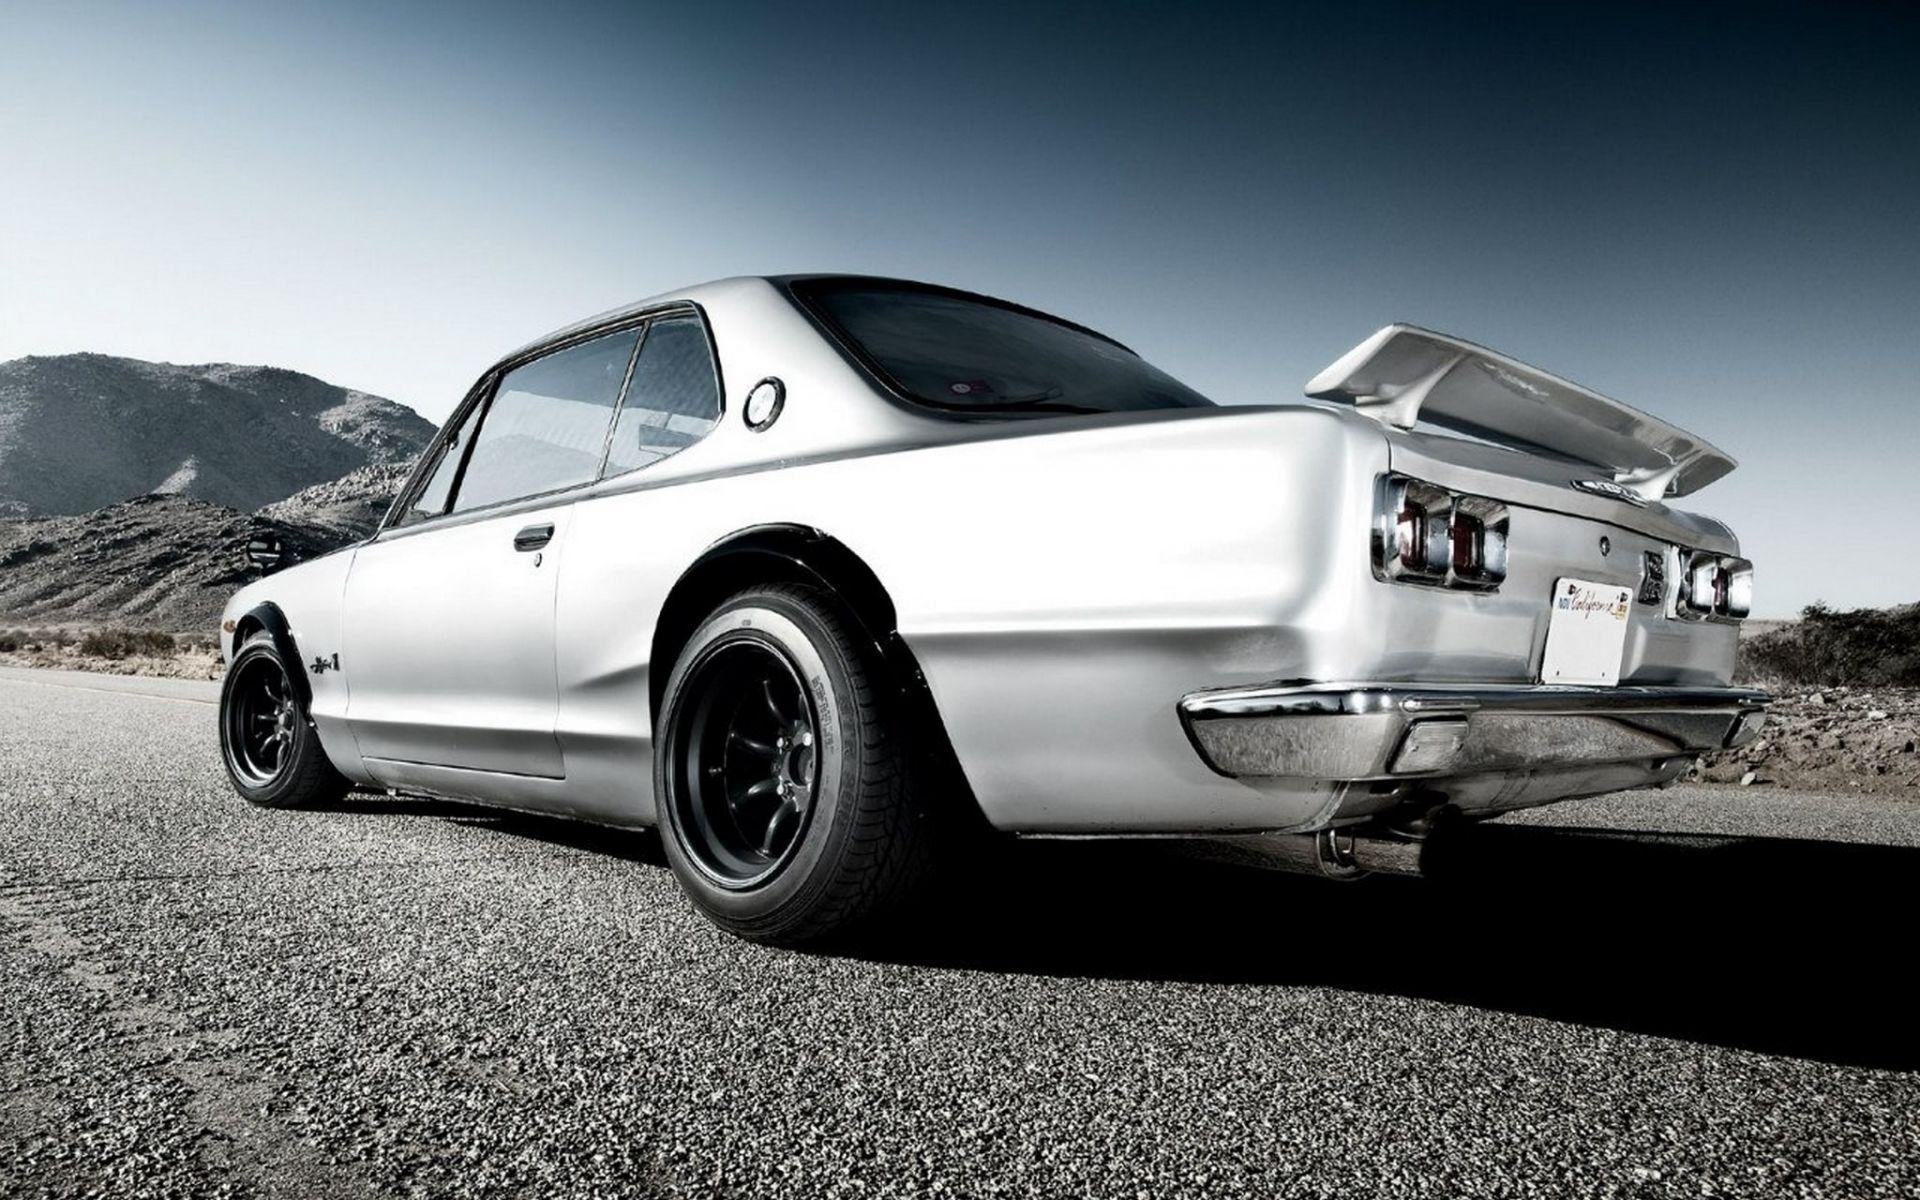 Classic cars jdm nissan skyline 2000 gtr hakosuka tuning wallpaper